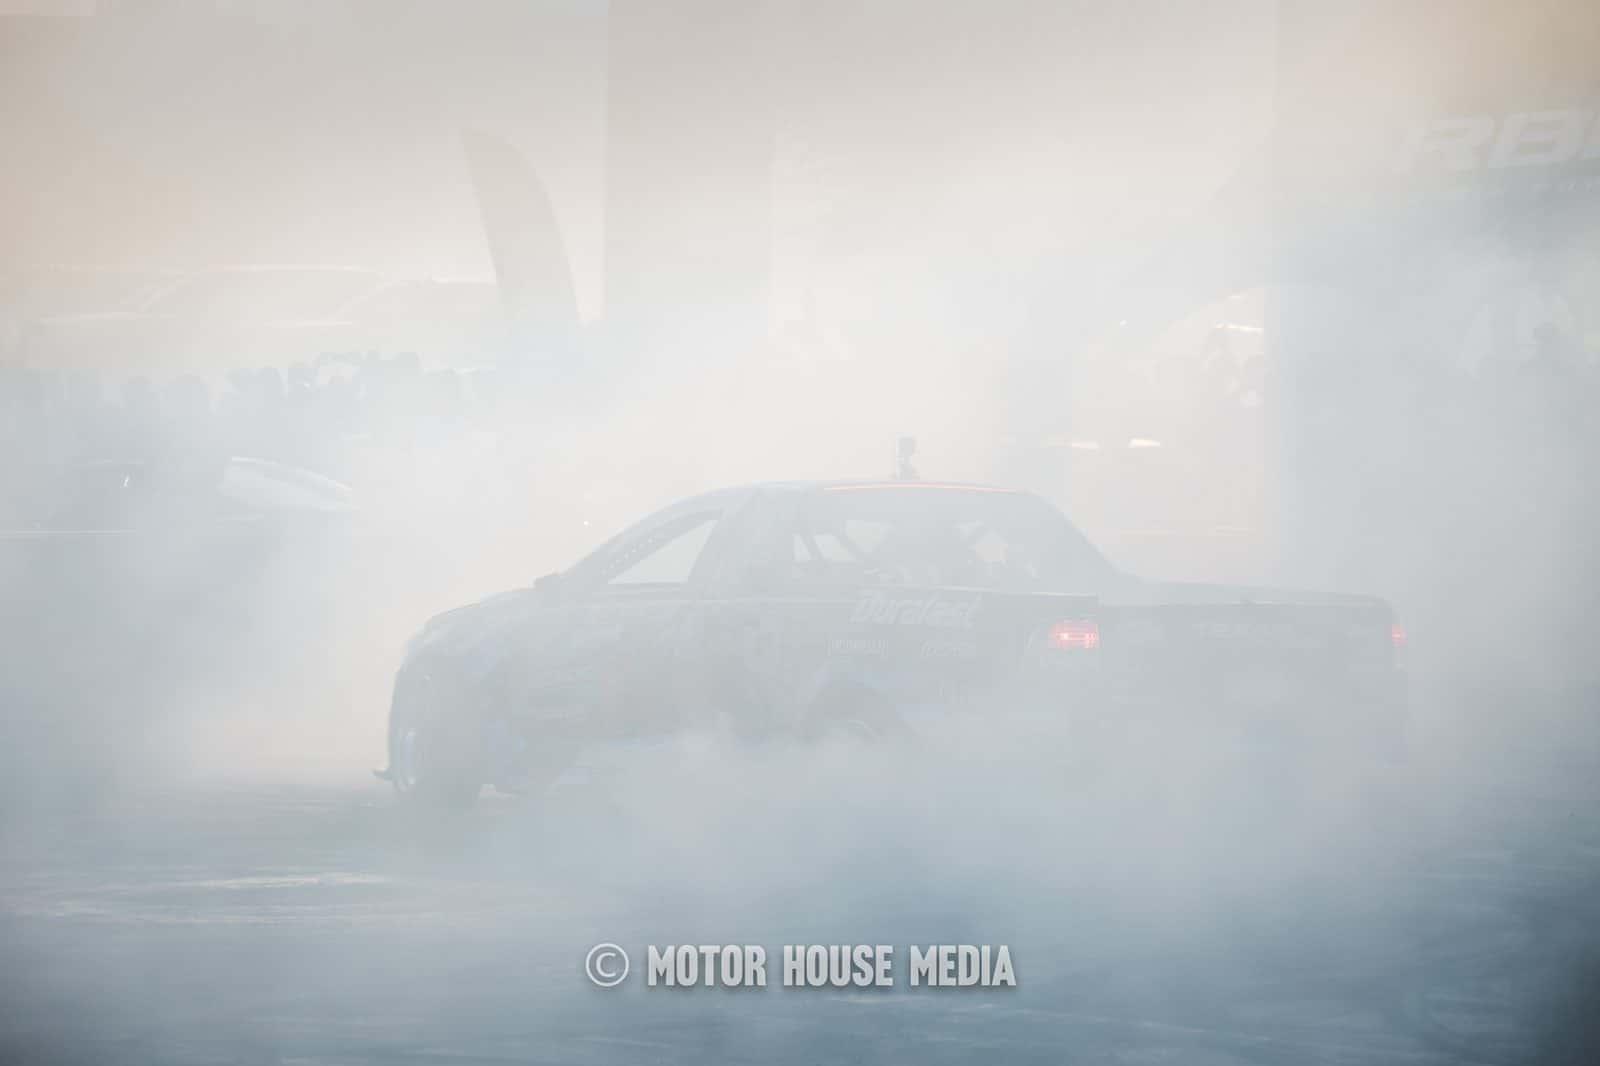 Josh Robinson drifting his Holden Ute